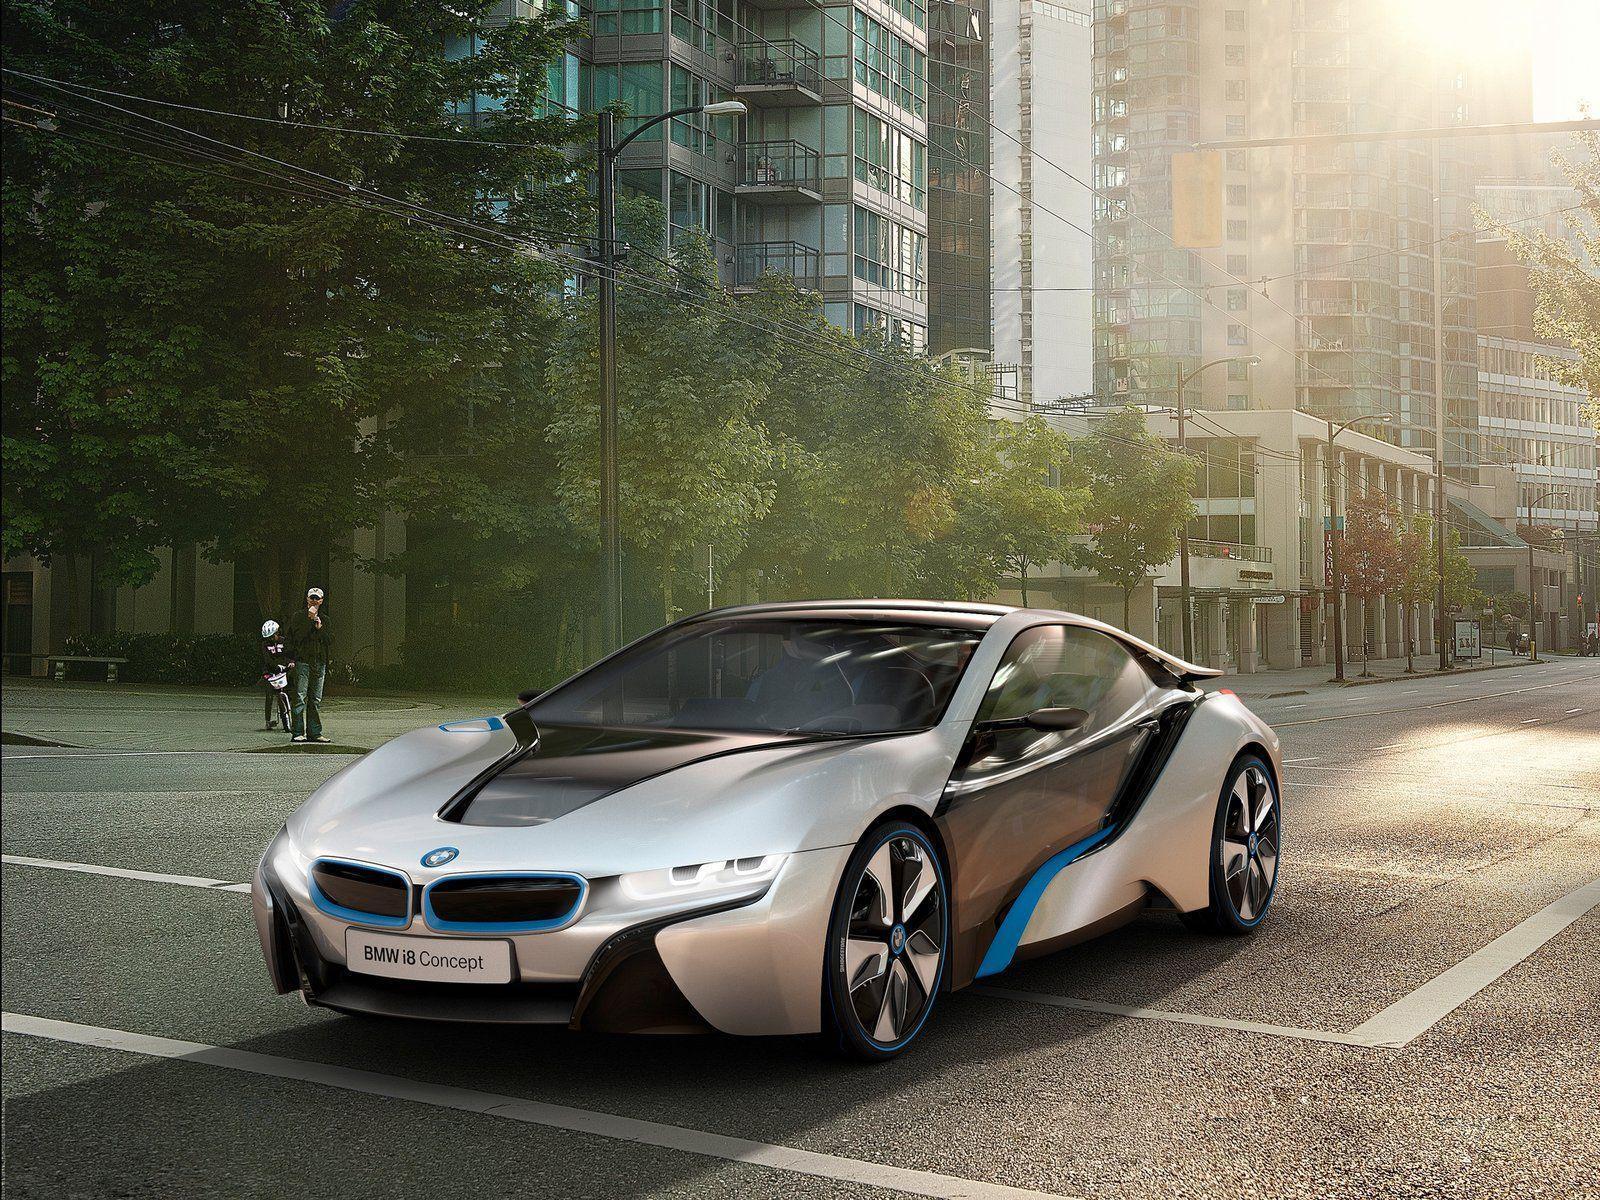 BMW I8 Wallpapers - Wallpaper Cave